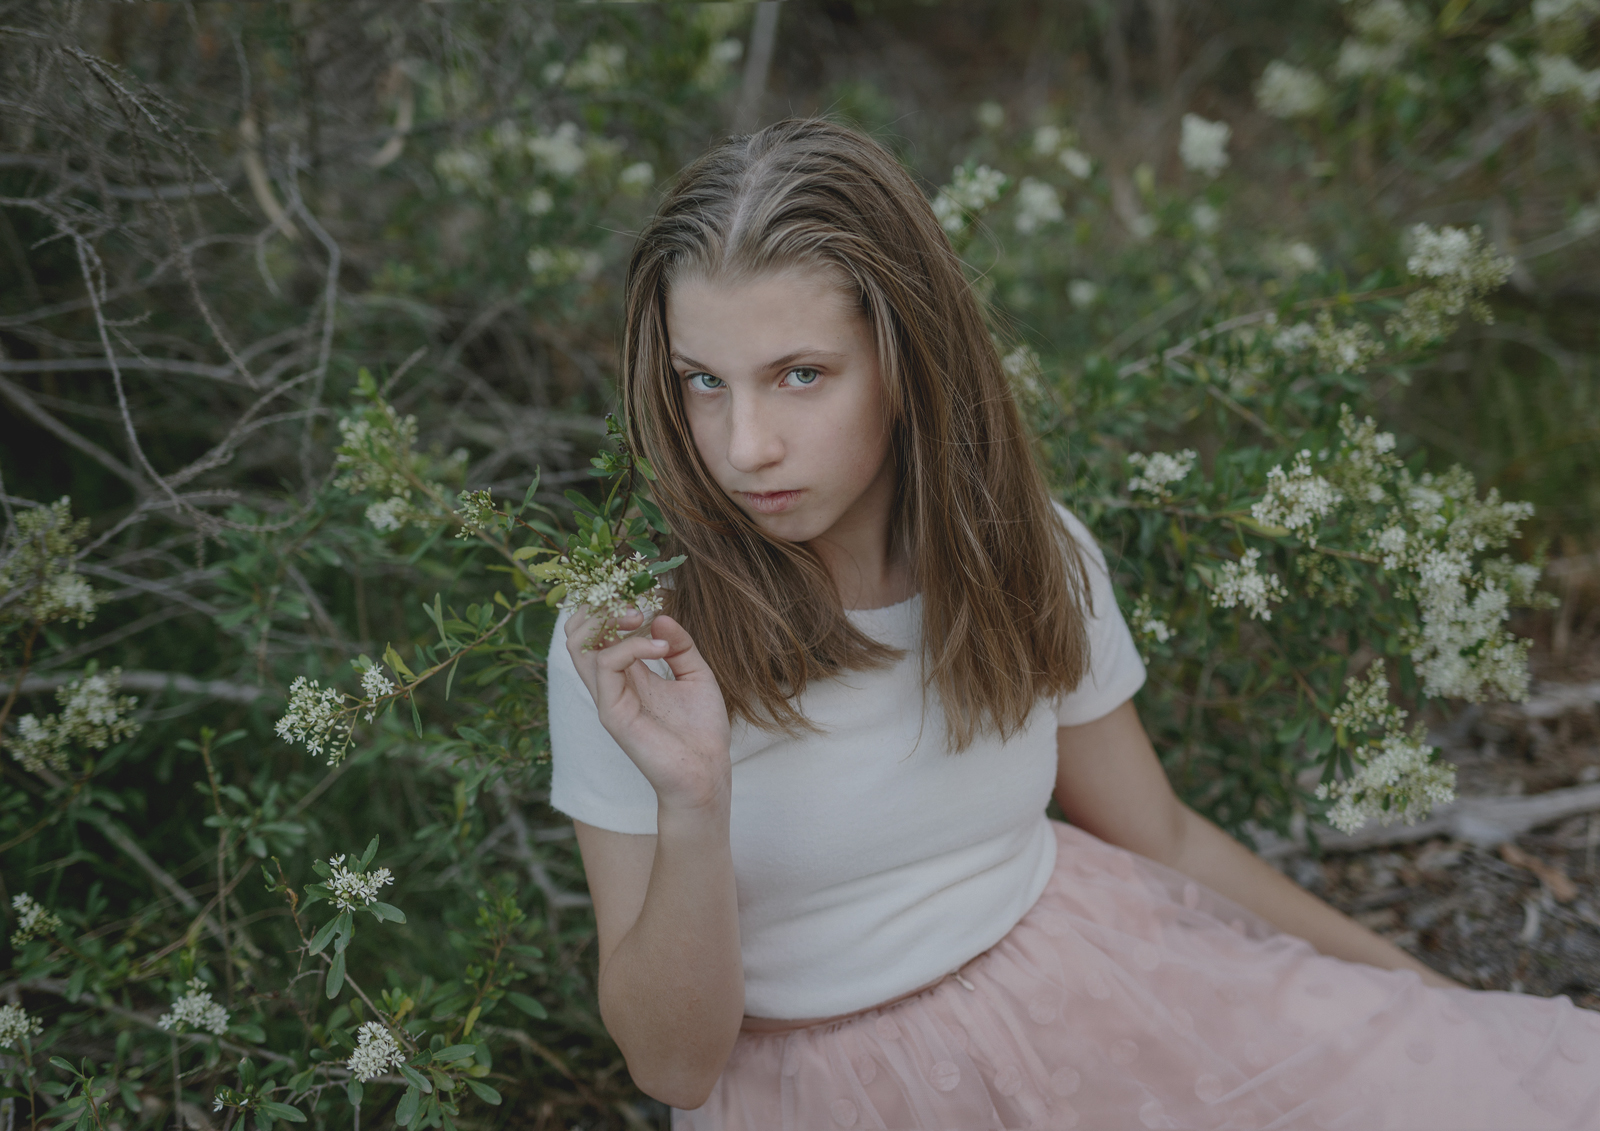 Natural Photos of your Teenage girl